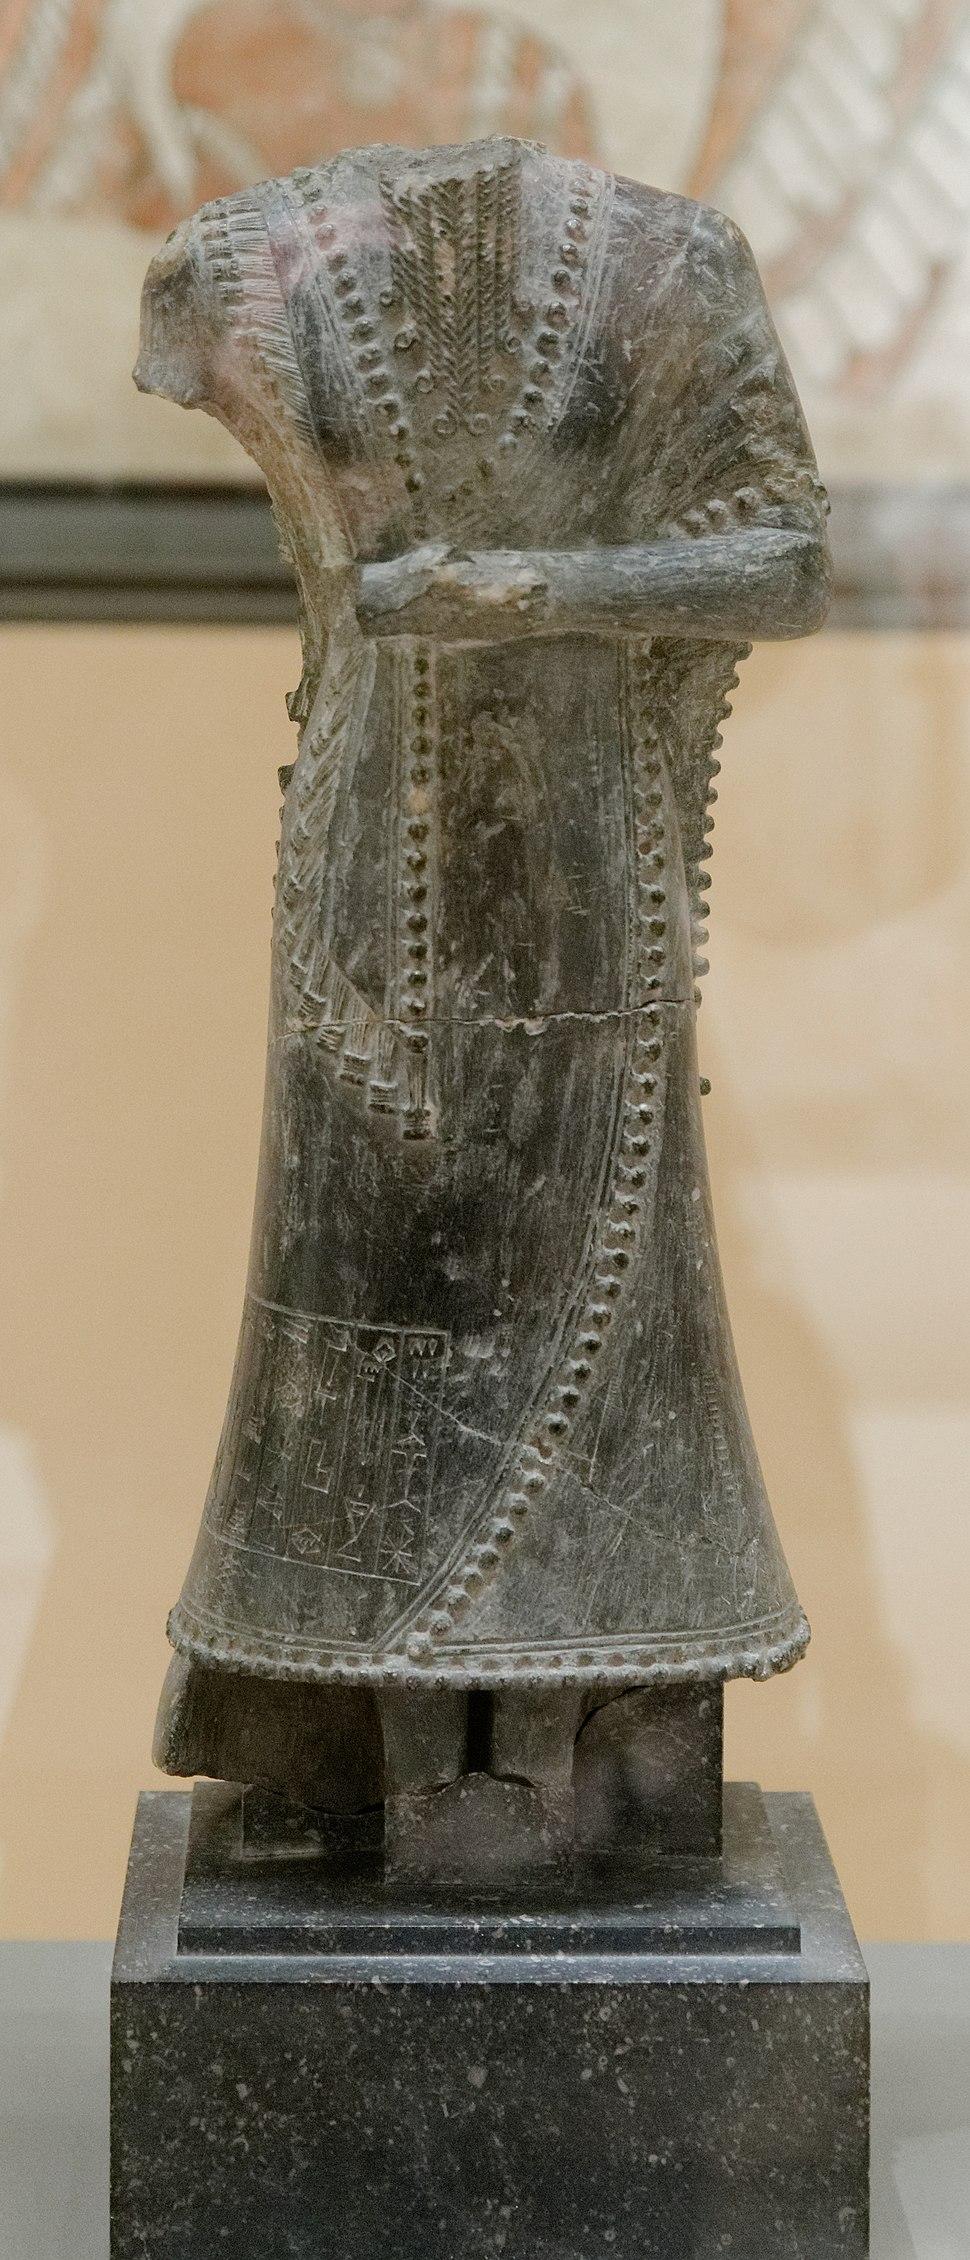 Idi-ilum Louvre AO 19486 n01